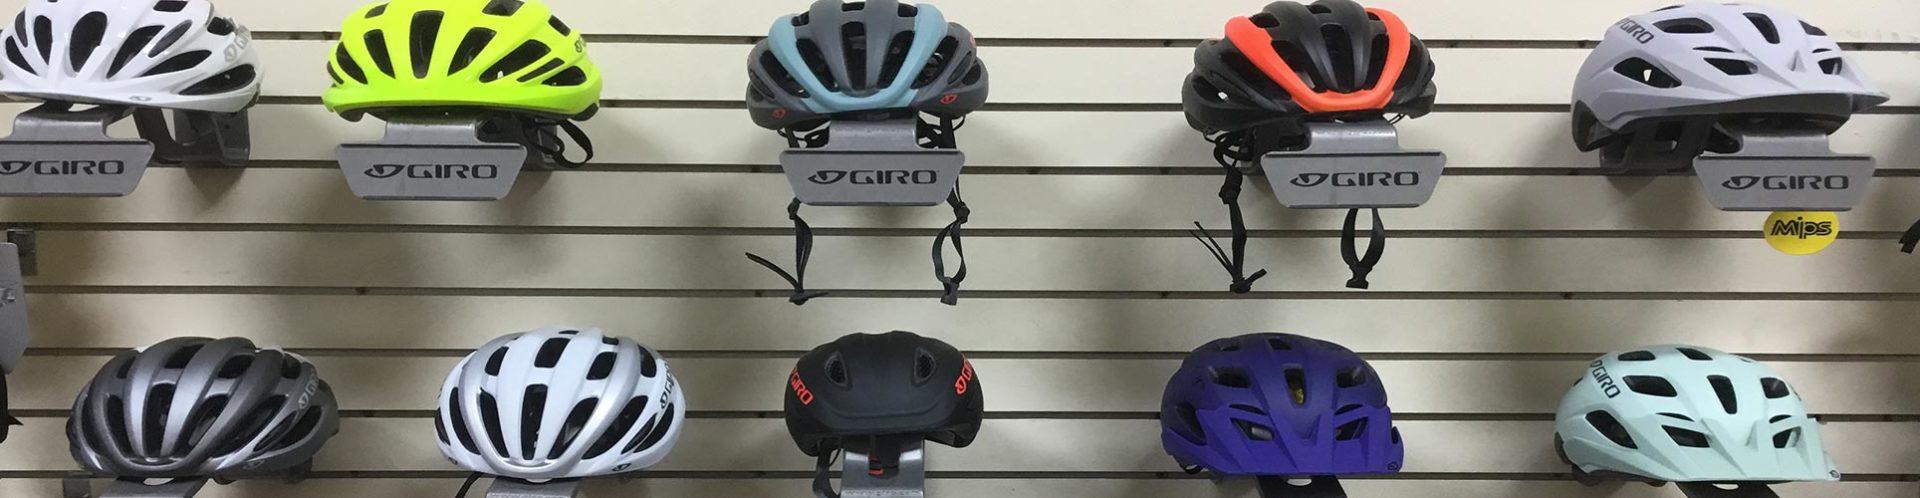 8a0110629f5 Troy Family Bike Shop | Electric Bikes | Troy, OH